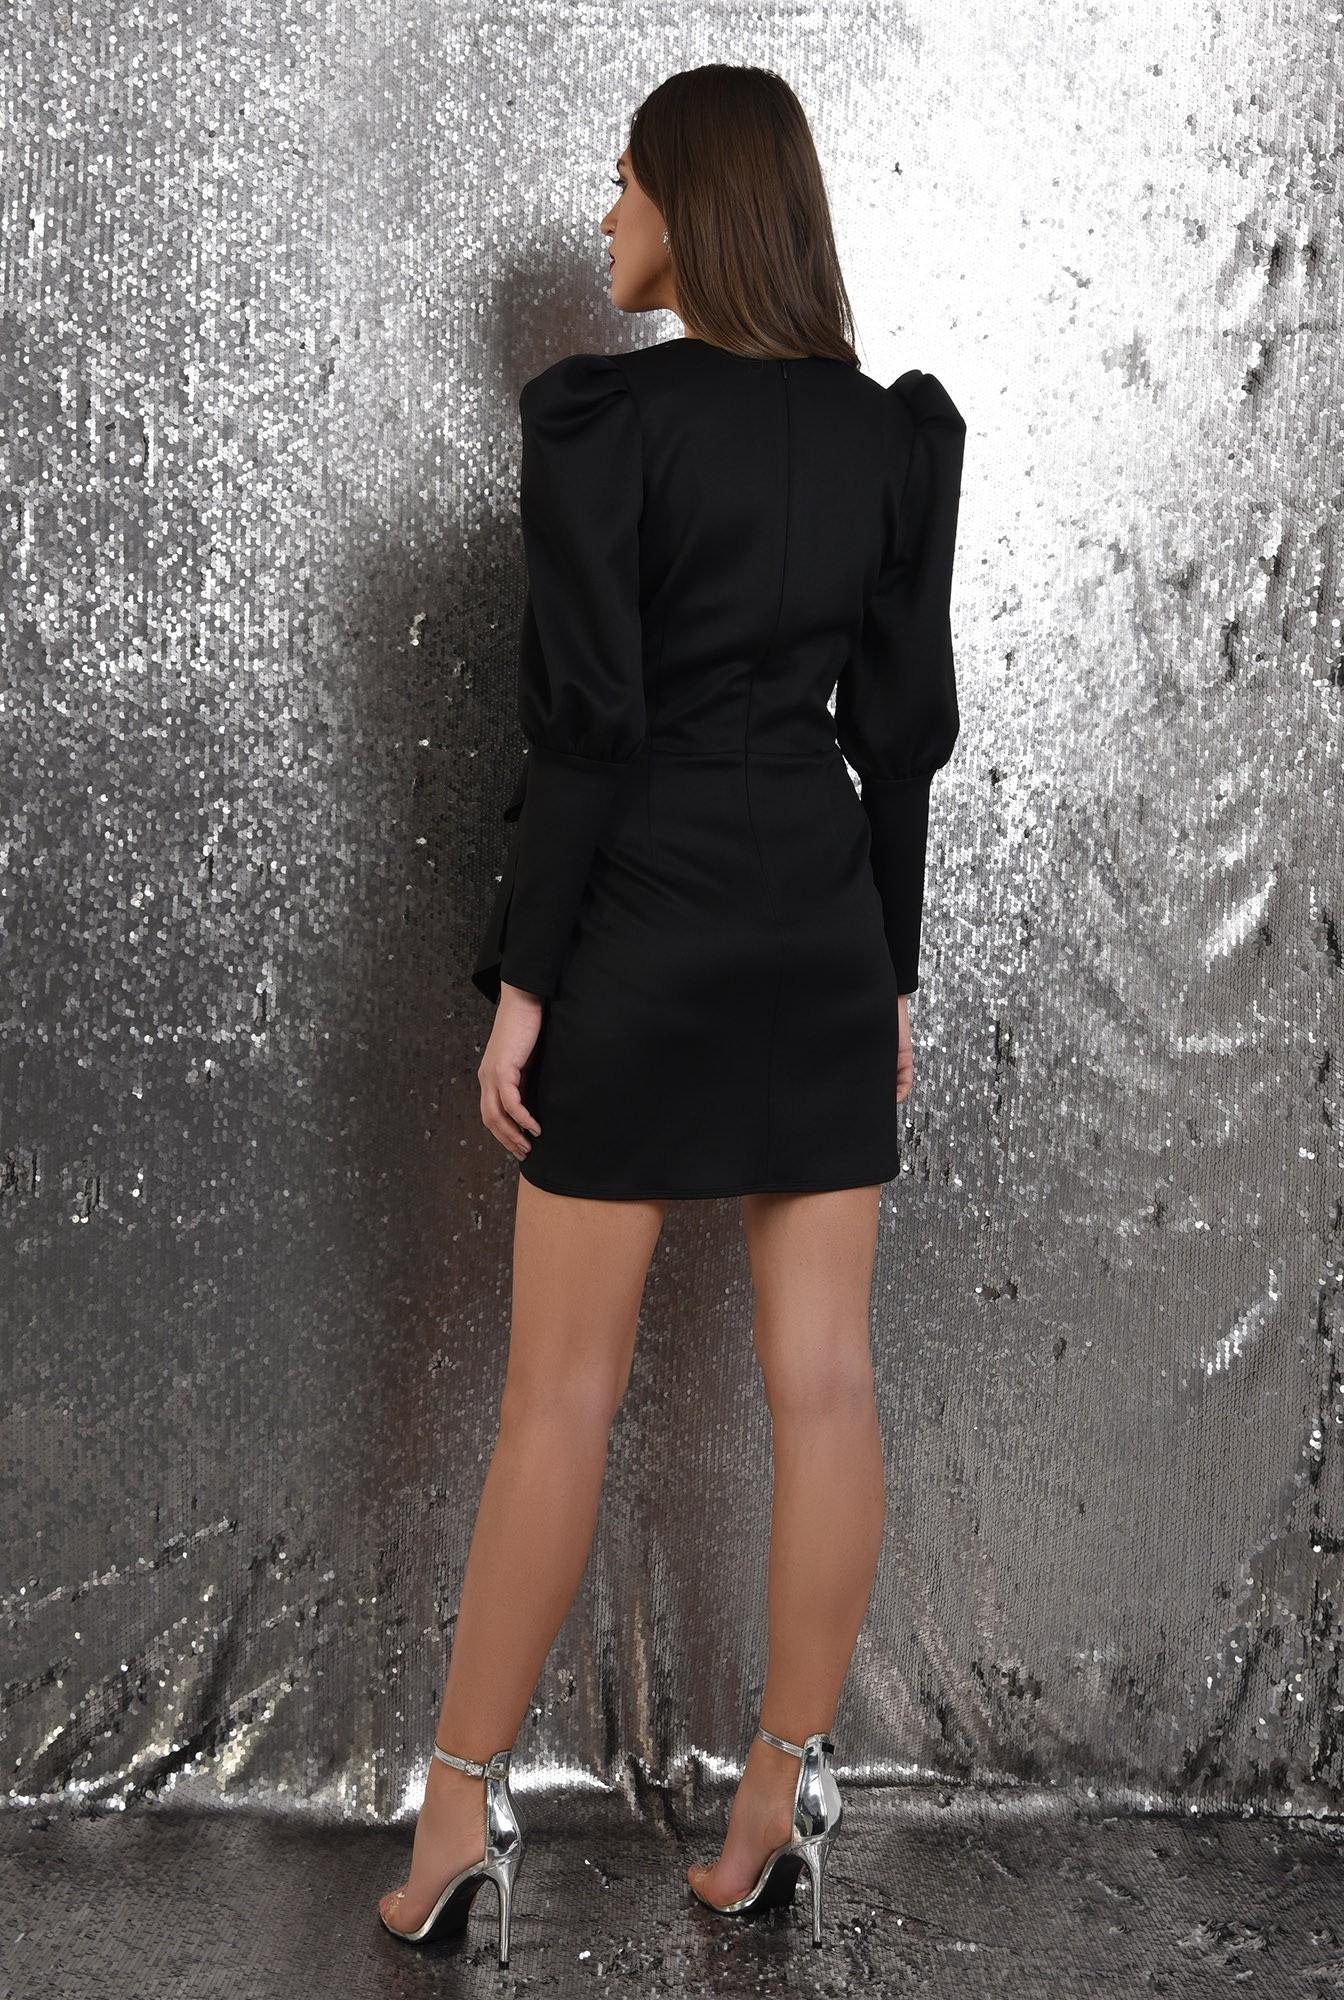 1 - rochie neagra, petrecuta, cu funda, maneci muton, Poema, rochie de seara